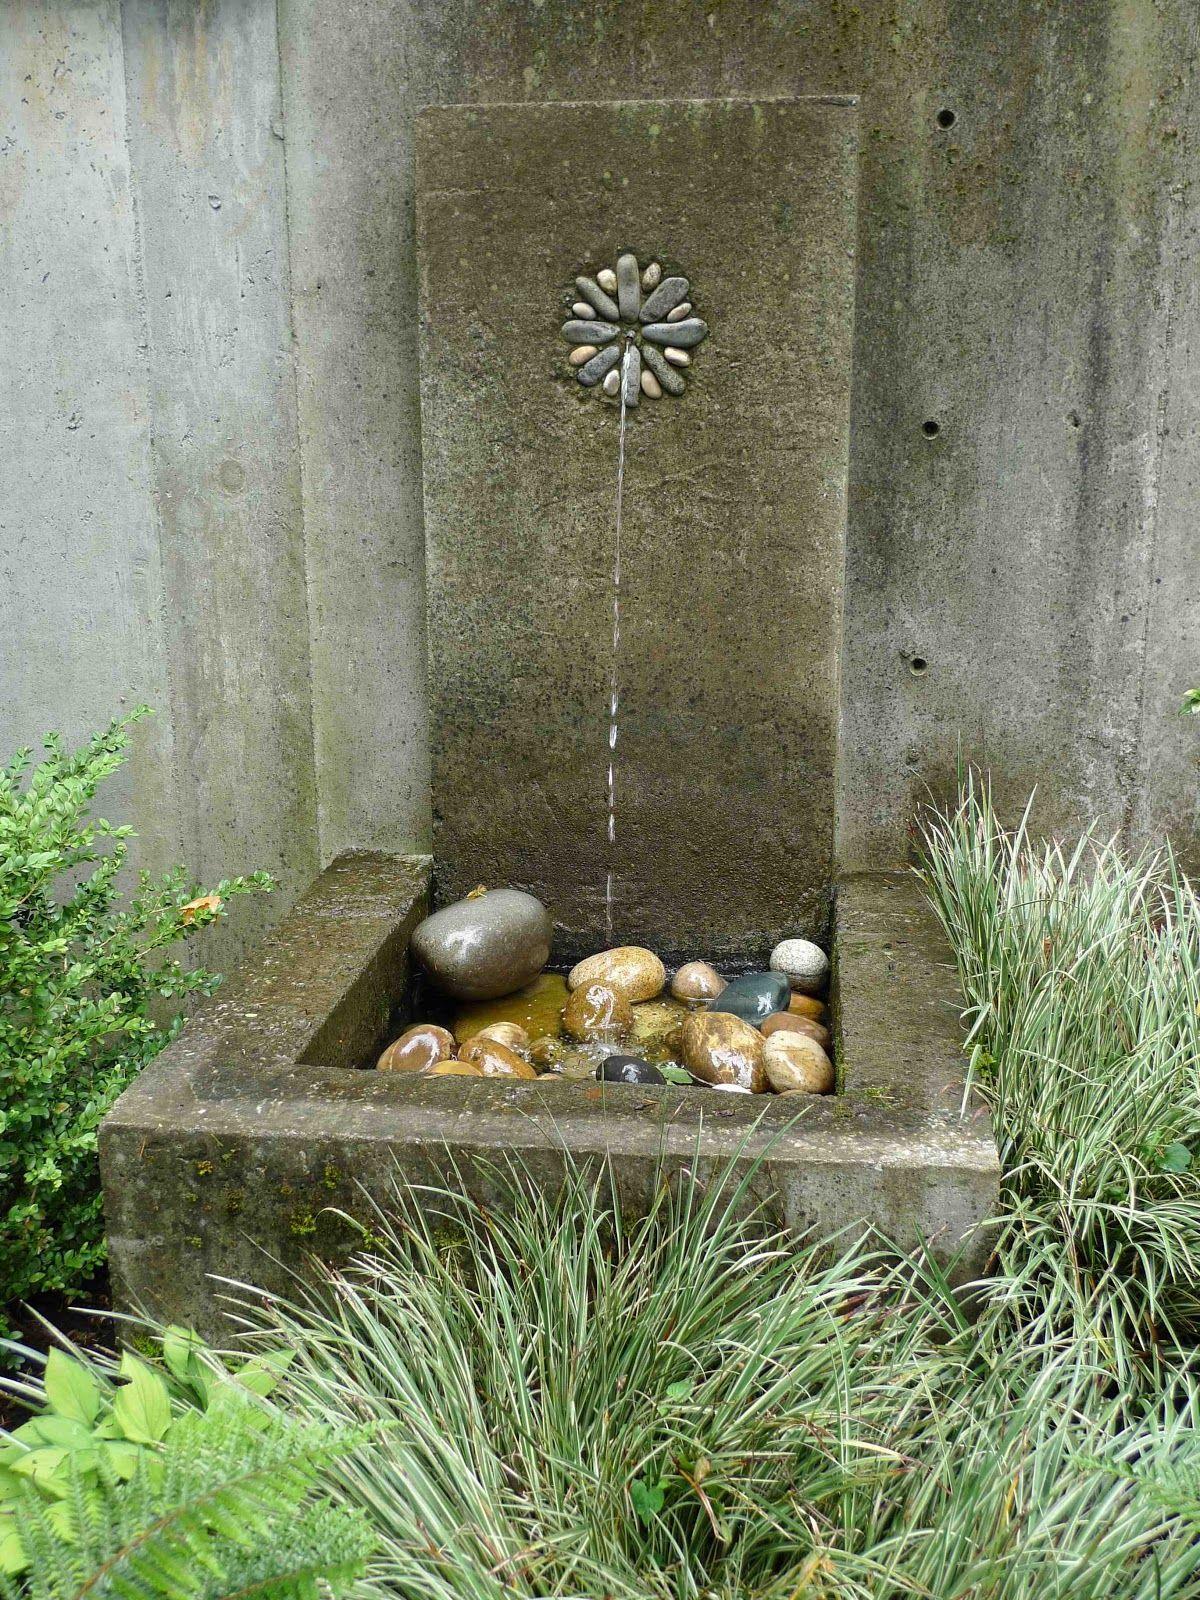 cast concrete fountain with pebble mosaic insert by Jeffrey Bale